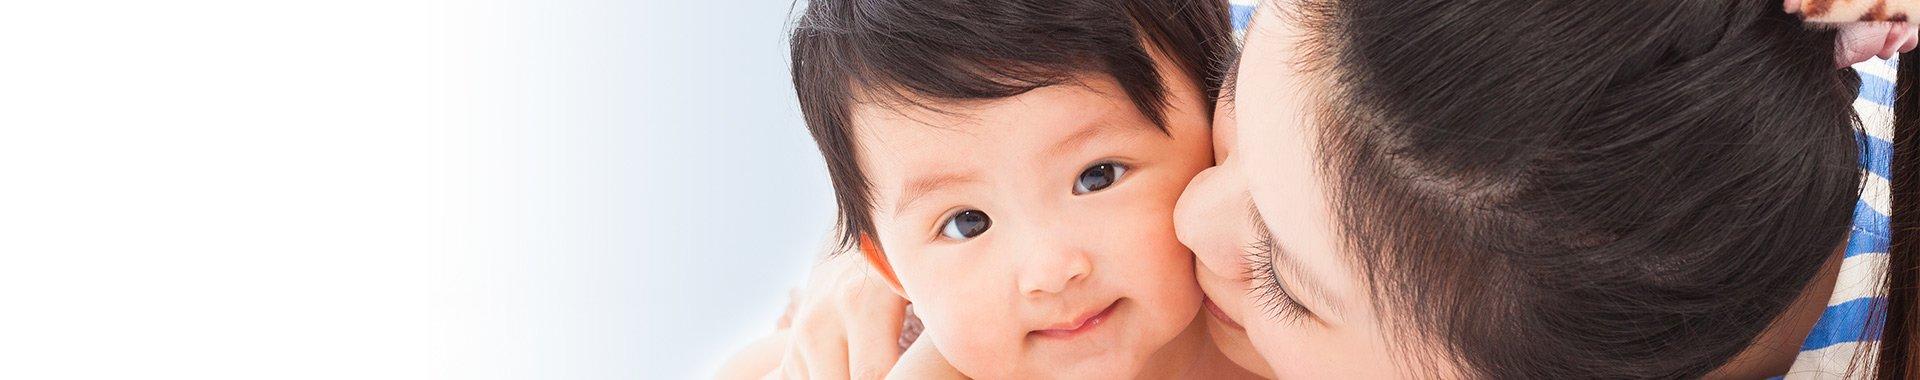 Our Pregnancy and Baby Team | Good Samaritan Medical Center